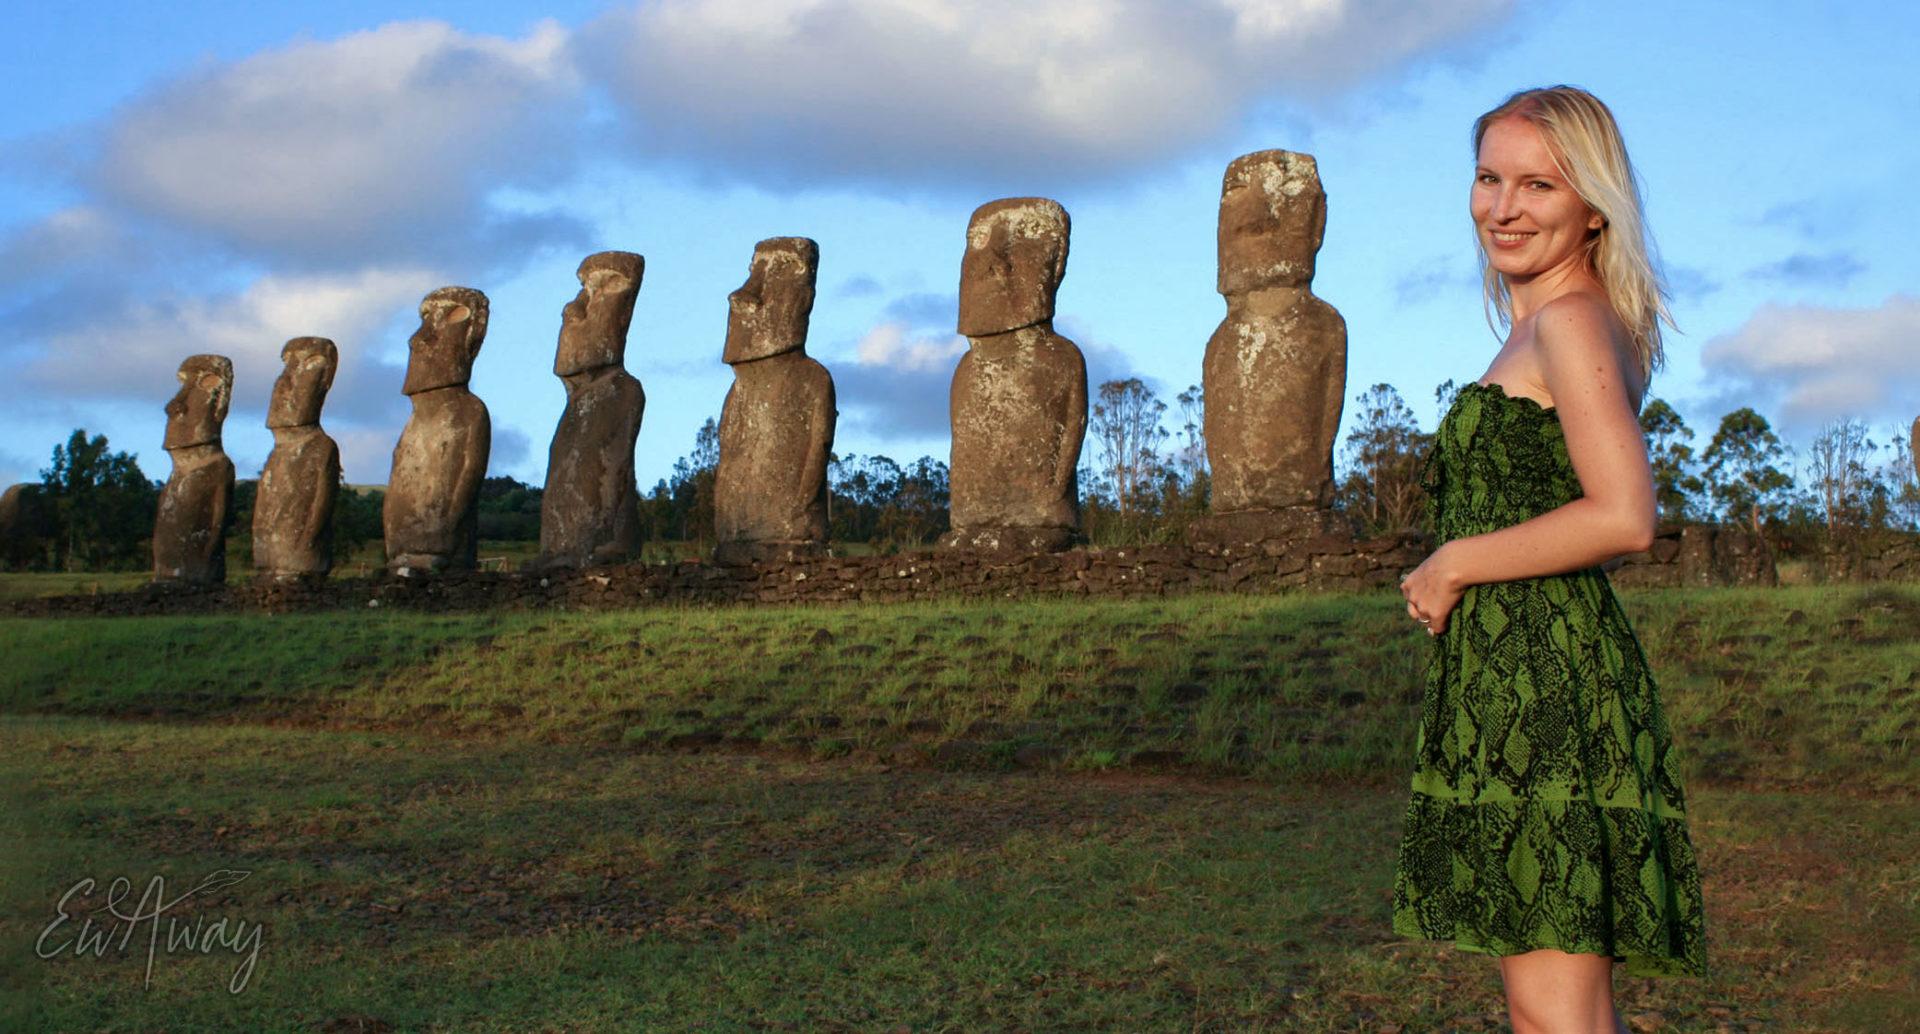 Wyspa Wielkanocna, Moai, Rapanui